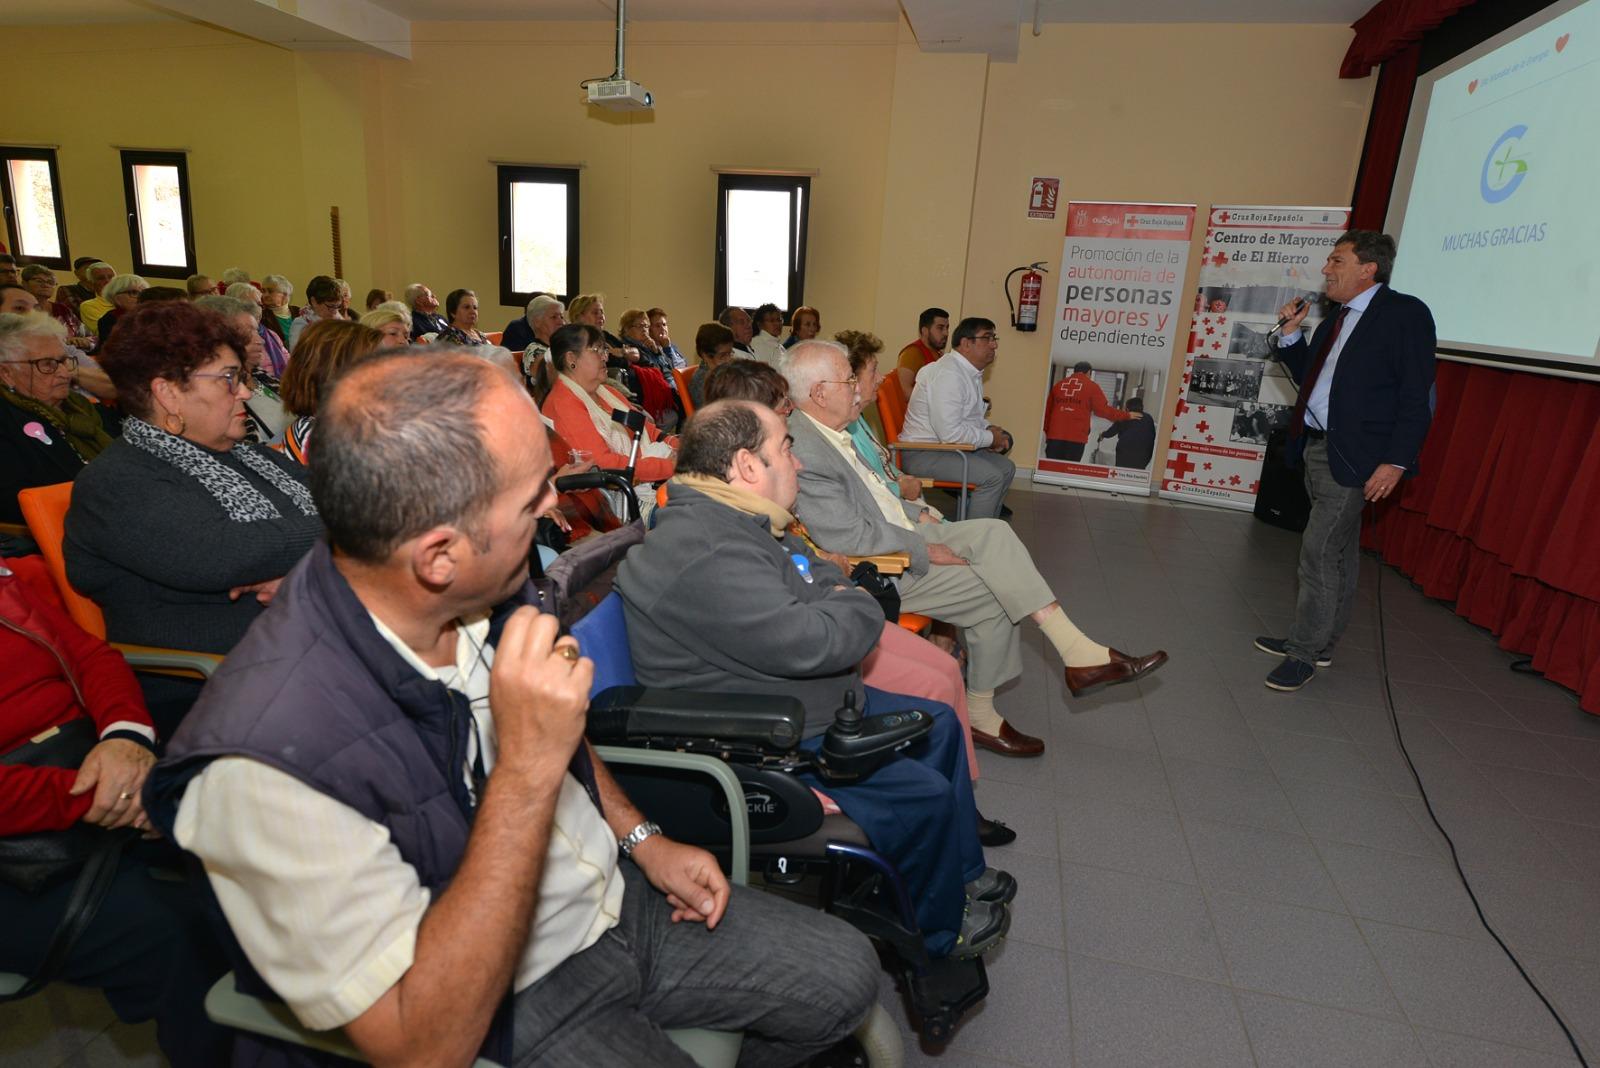 El Hierro's senior citizens mark World Energy Day with Gorona del Viento